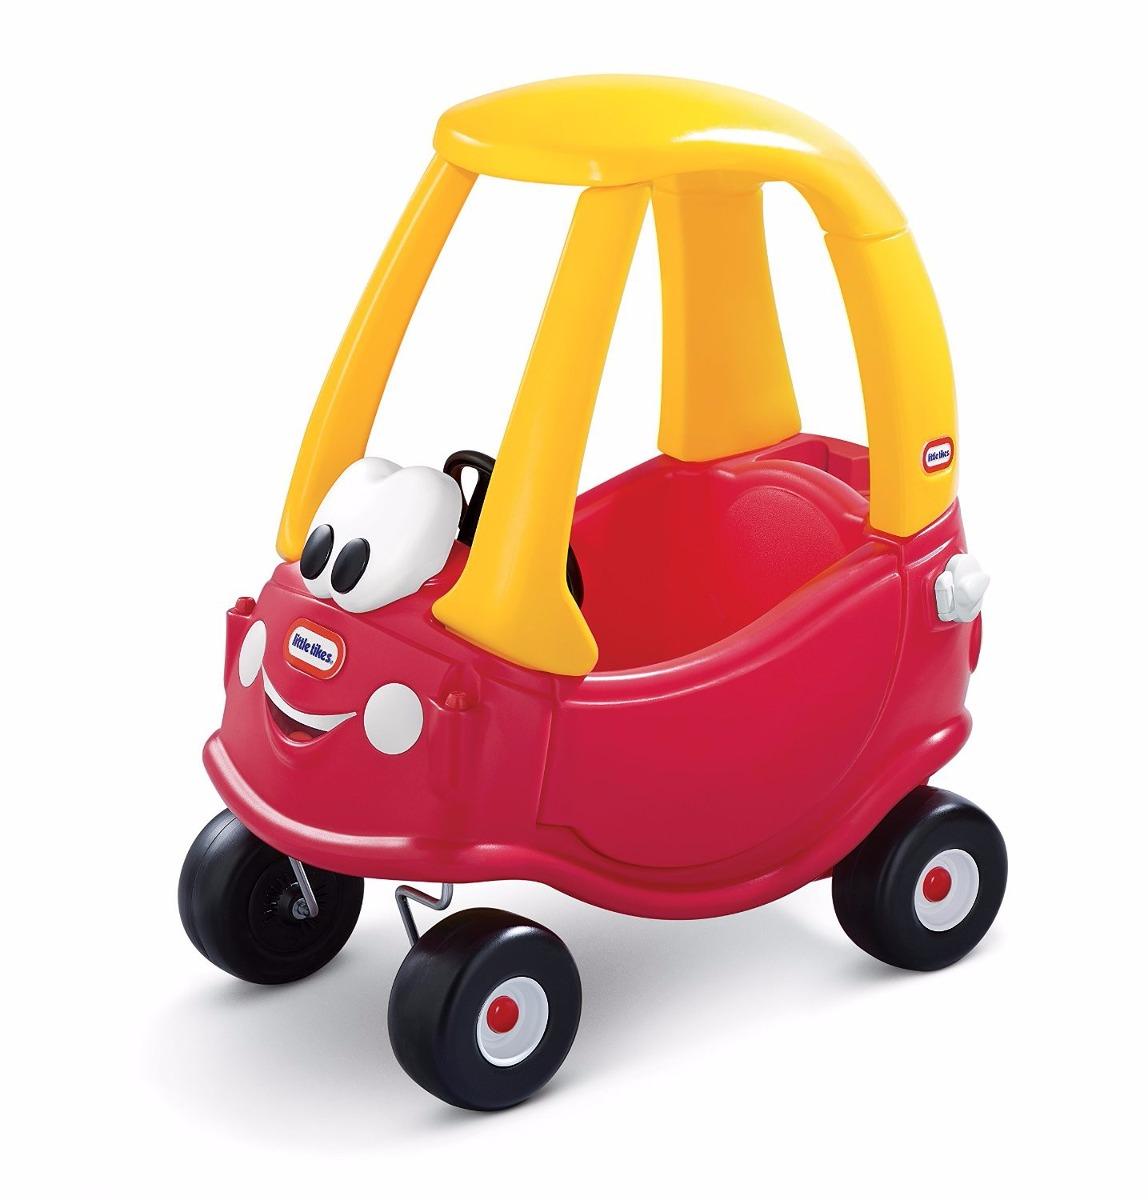 Carro Coupe Montable Juguetes Ninos Little Tikes Importado